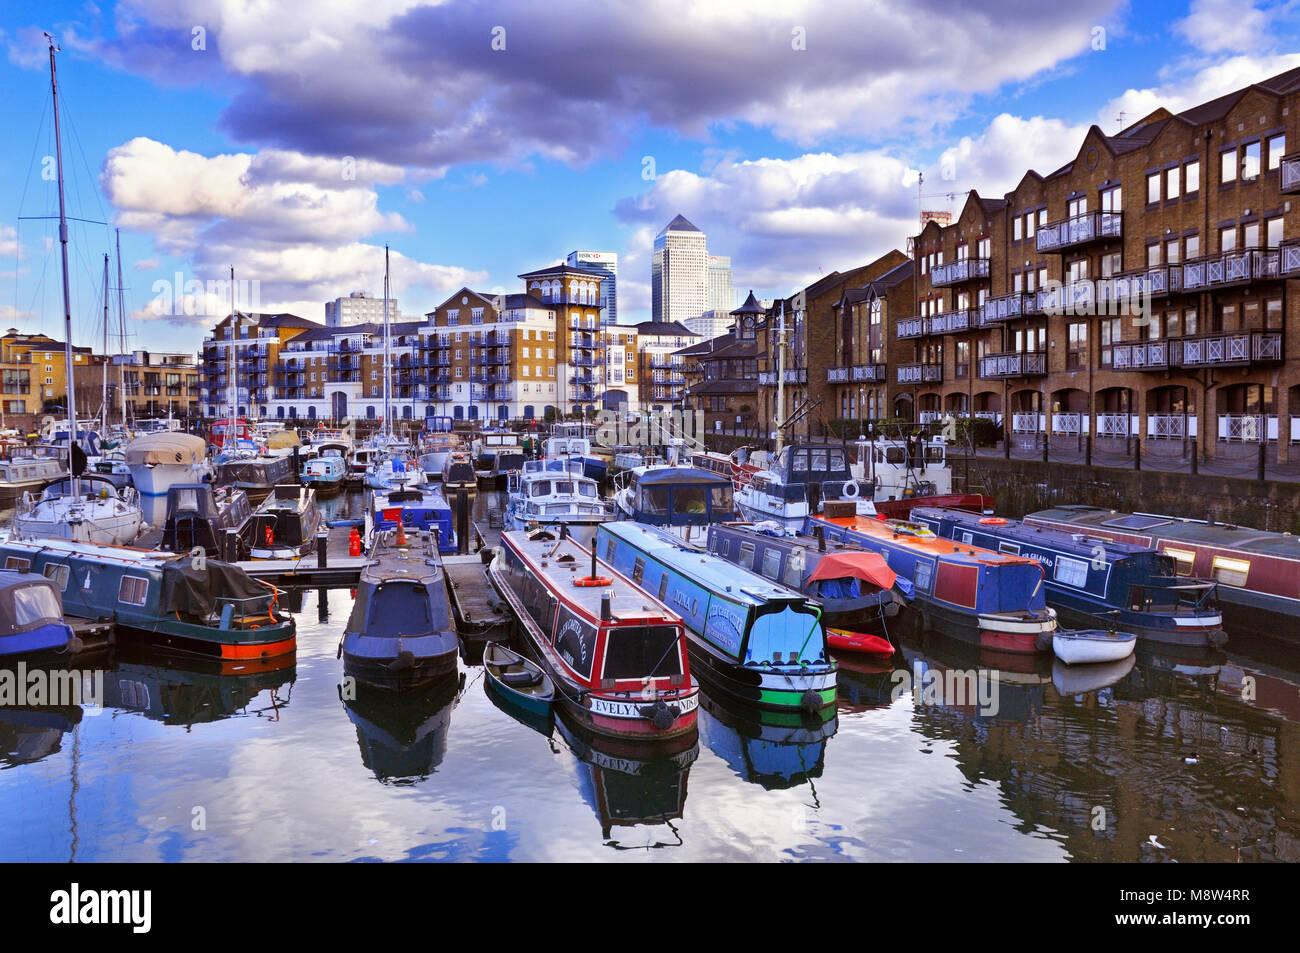 Limehouse Basin, Tower Hamlets, East London, UK Photo Stock